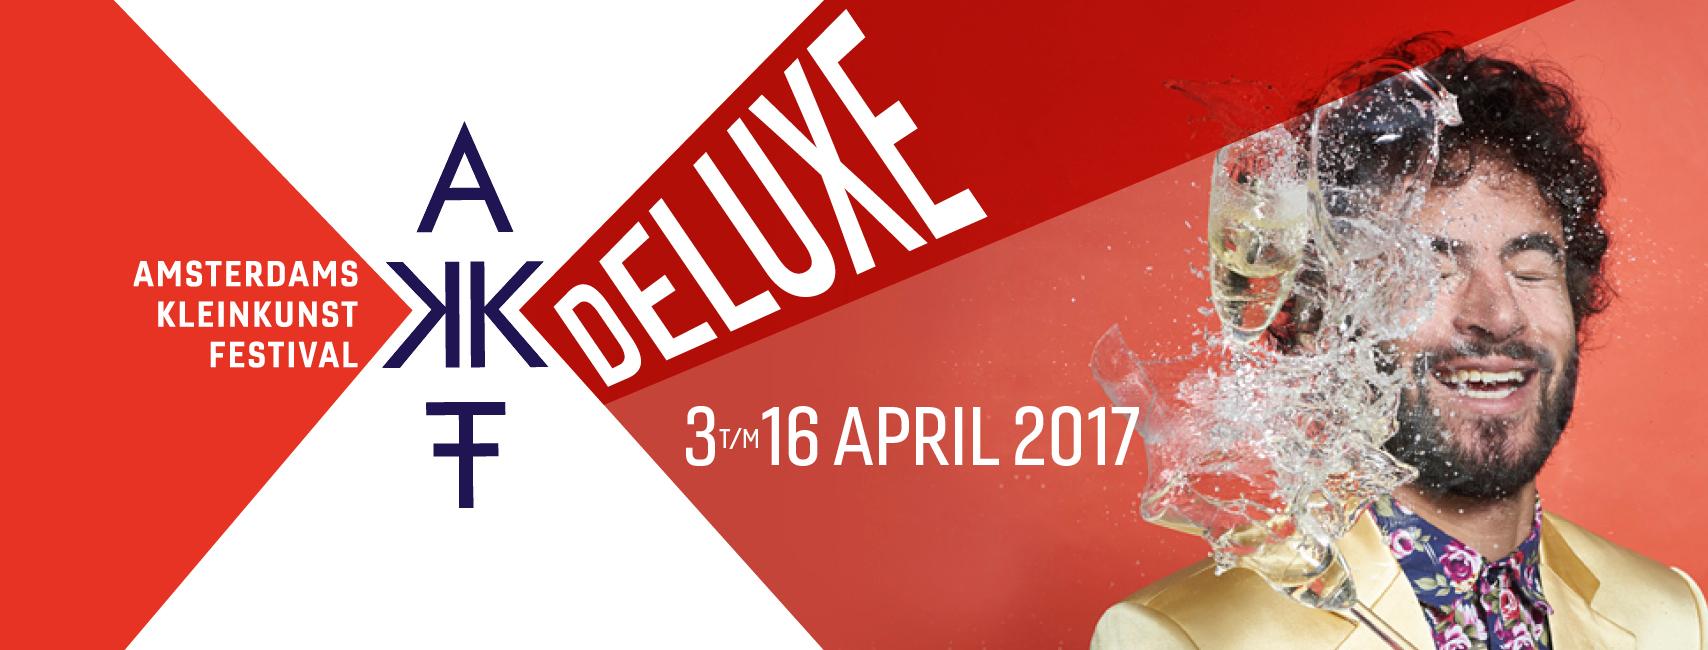 Amsterdams Kleinkunst Festival -